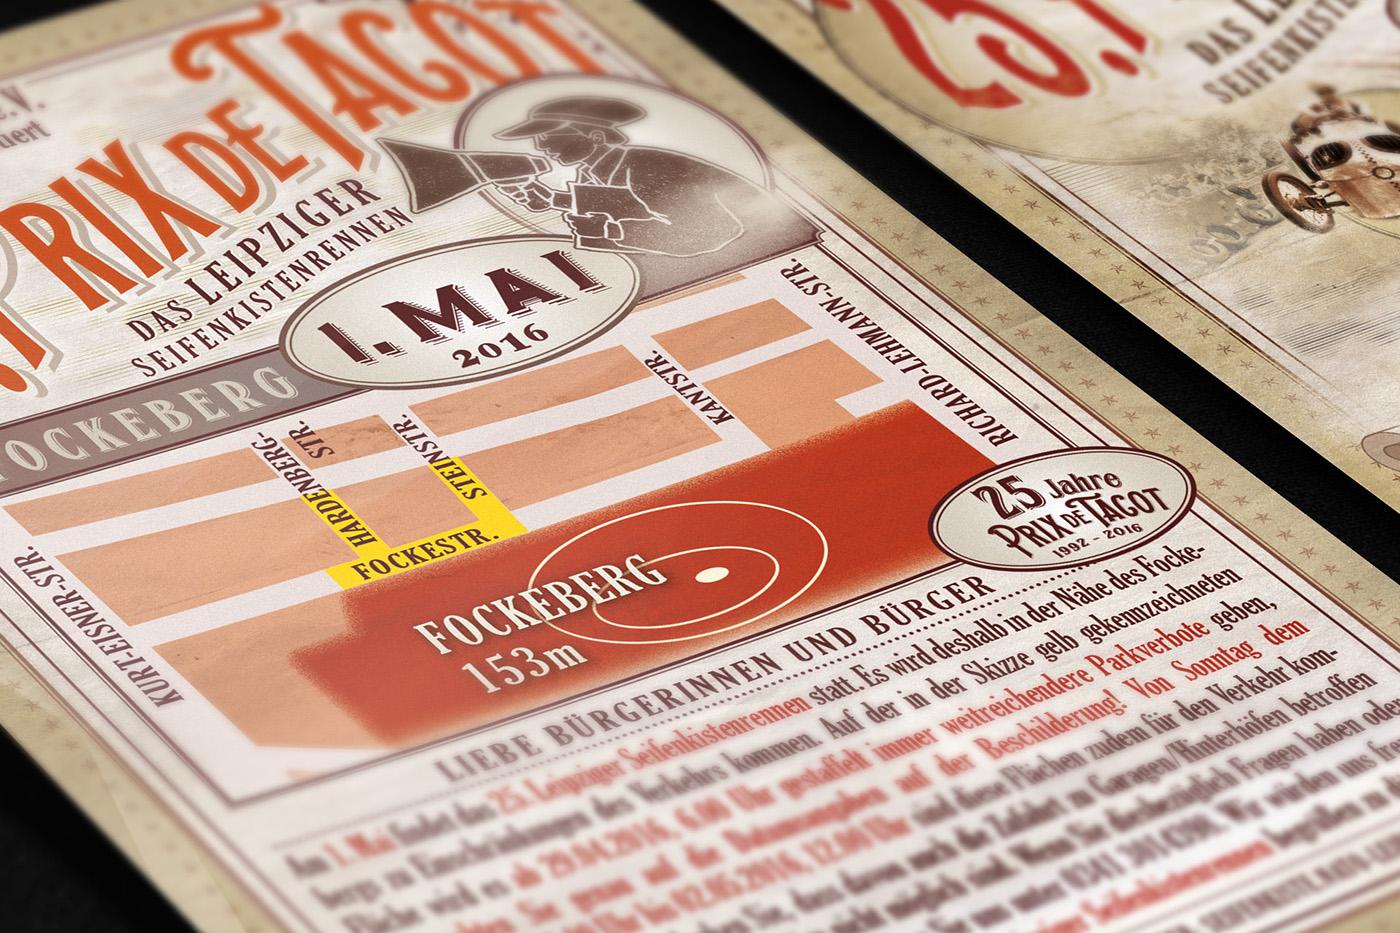 artwork vintage vintagegraphic soapbox leipzig graphicdesign